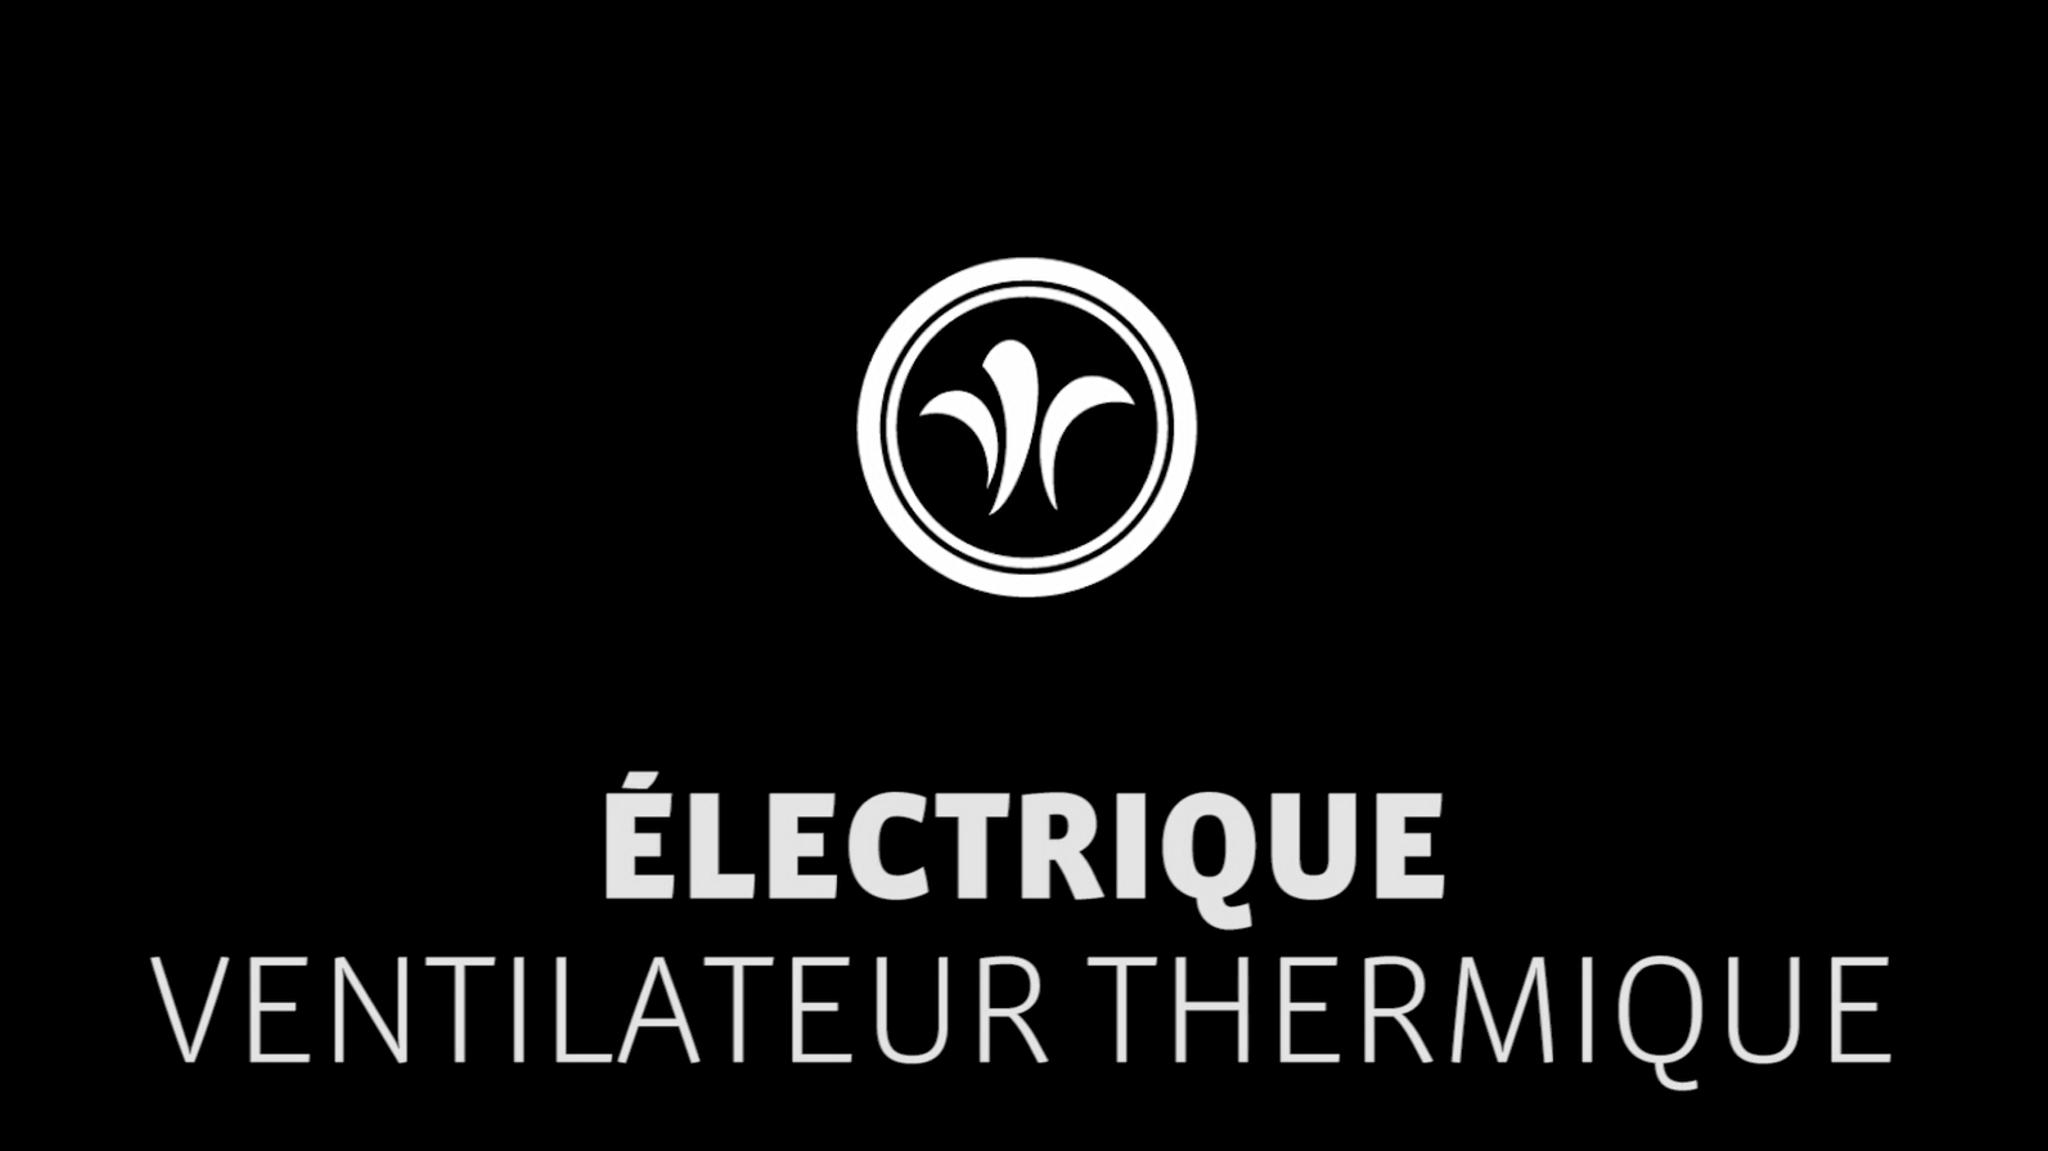 Ventilateur thermique pour camping-car // Niesmann+Bischoff - Camping-car (ARTO) // 2019 // EL6